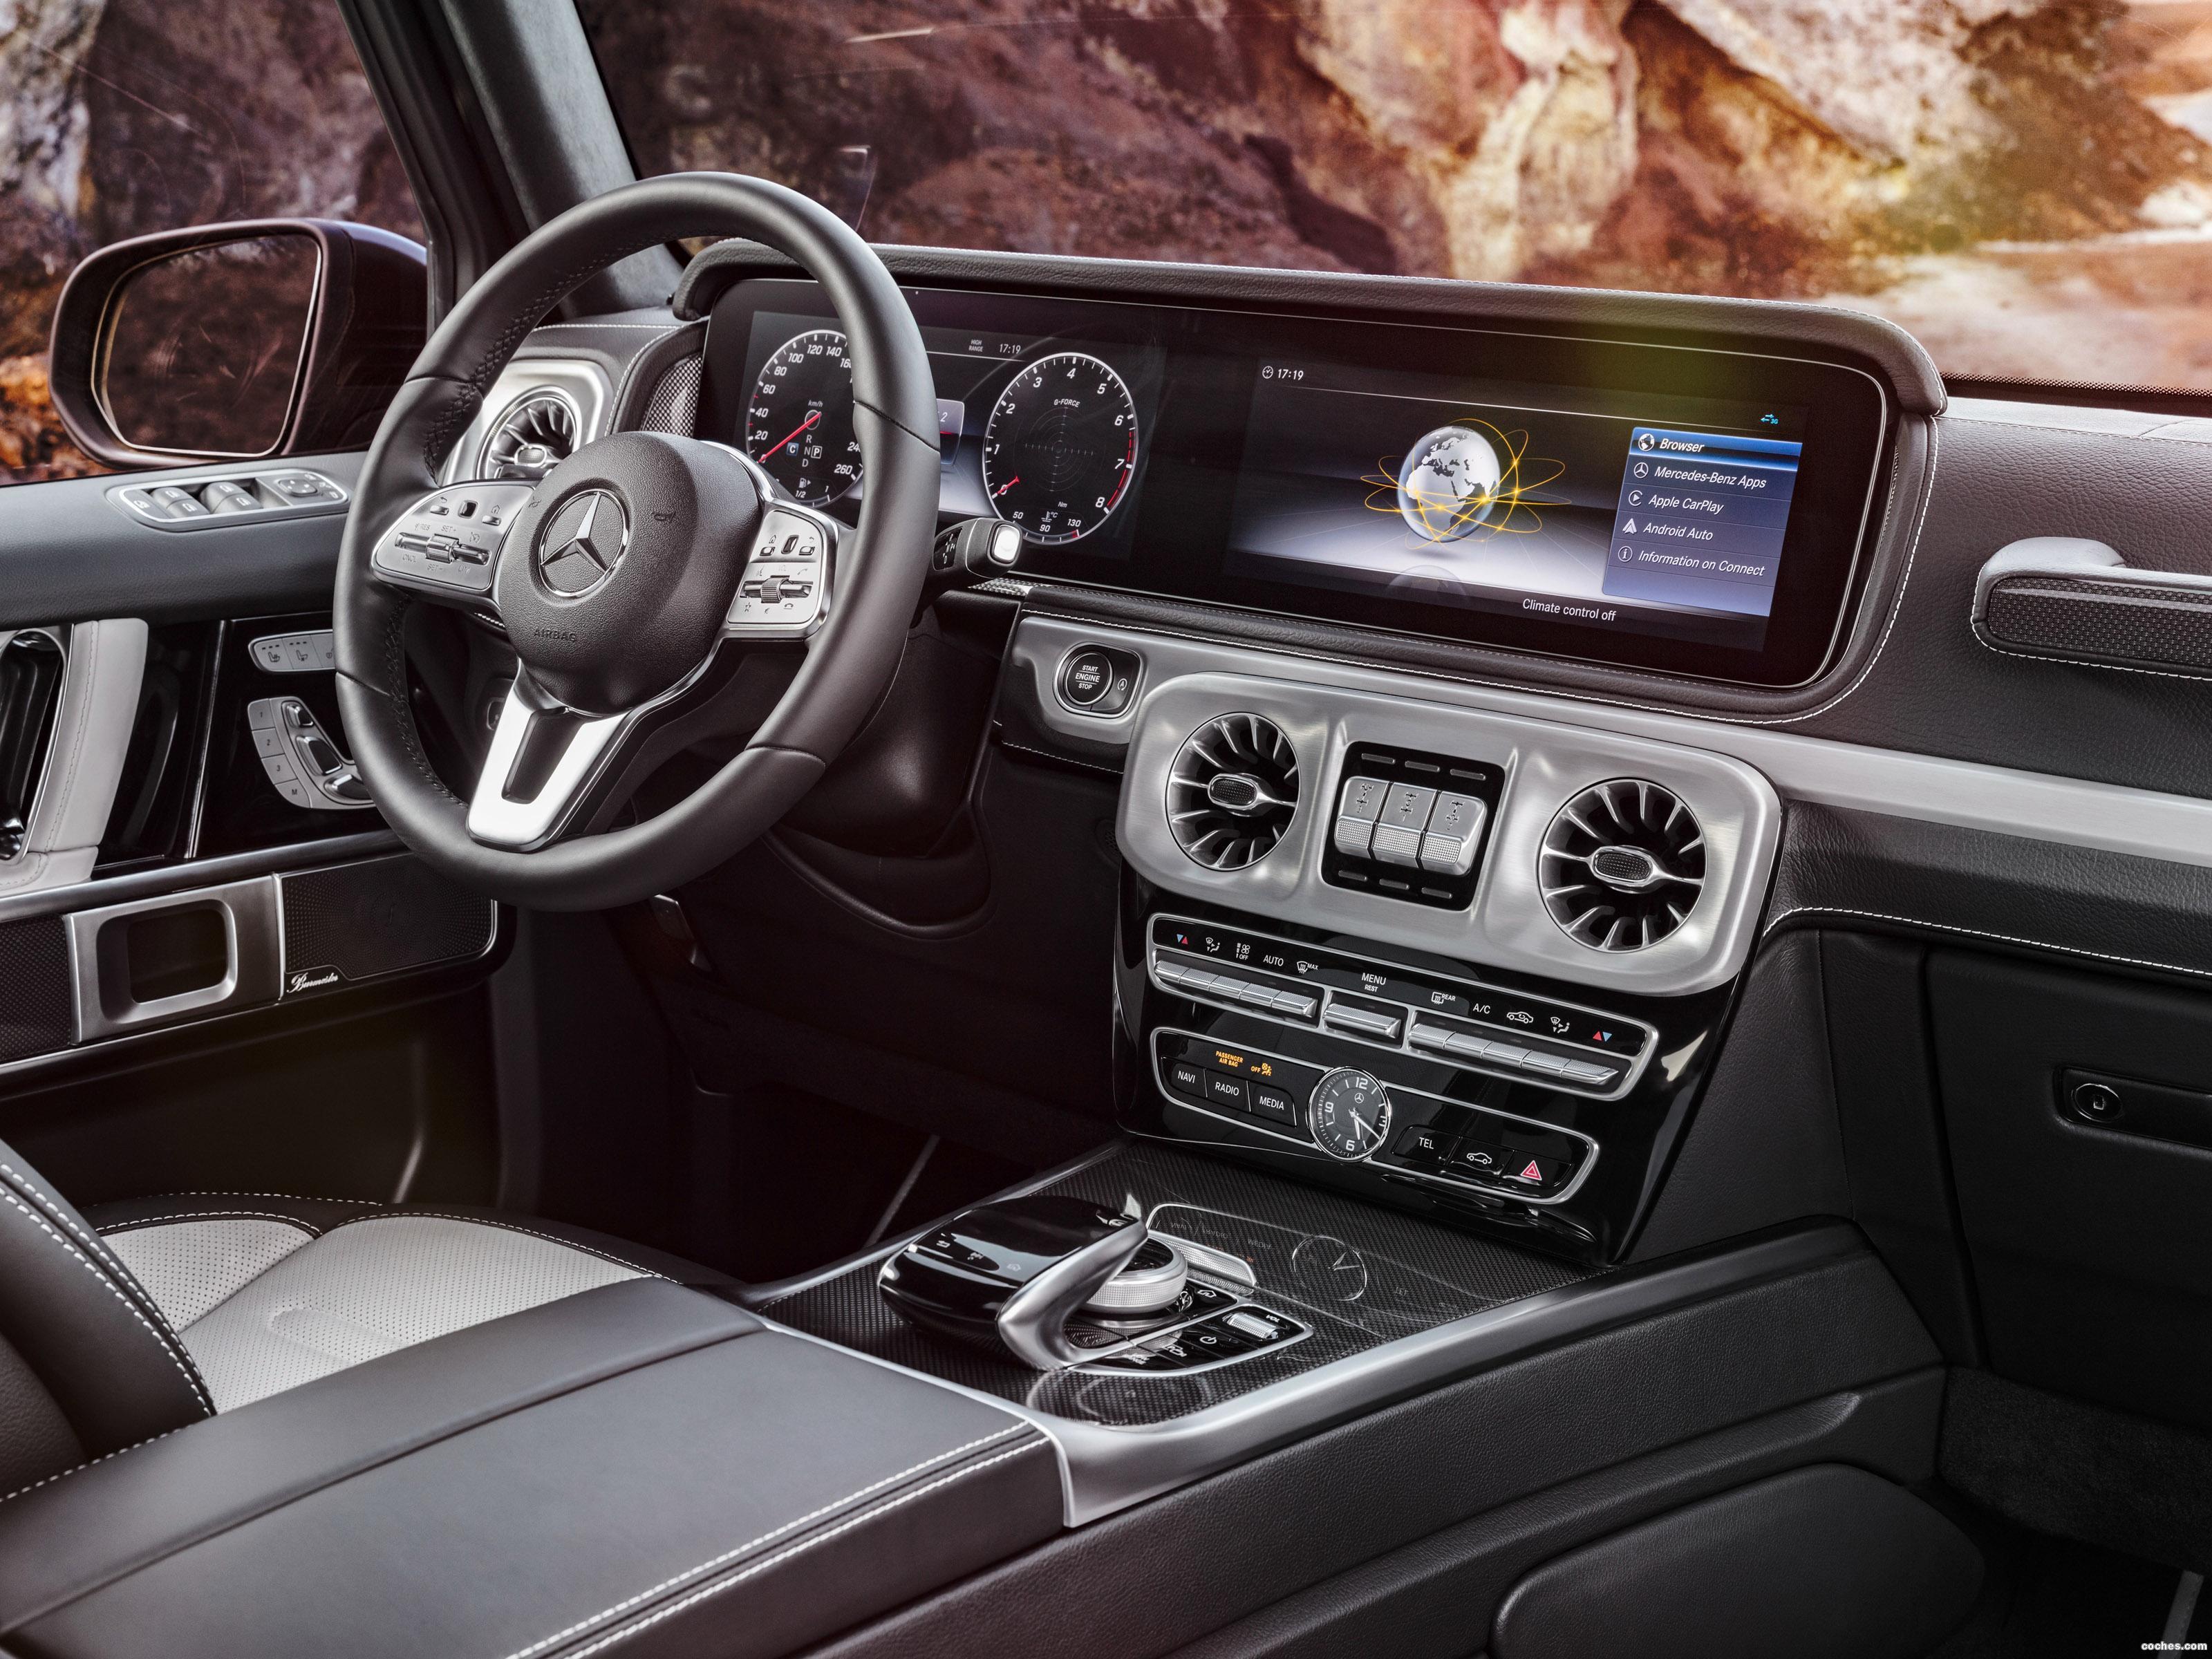 Foto 1 de Mercedes Clase G G 500 W464 2018